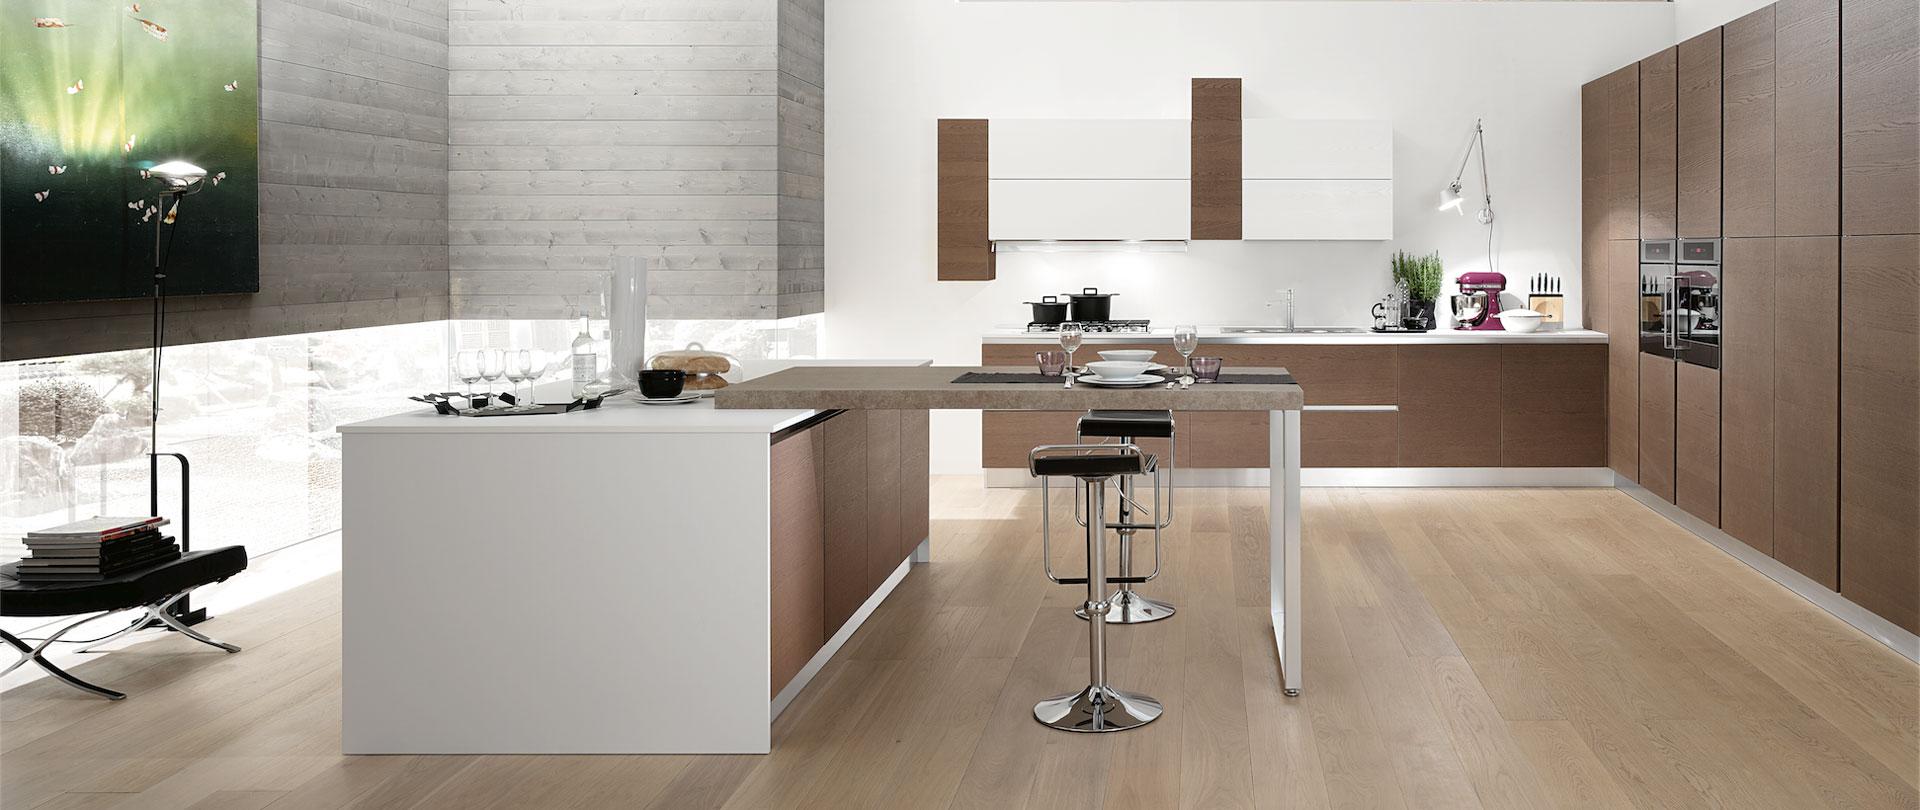 Vela cucinissima for Cucina moderna 2018 pdf